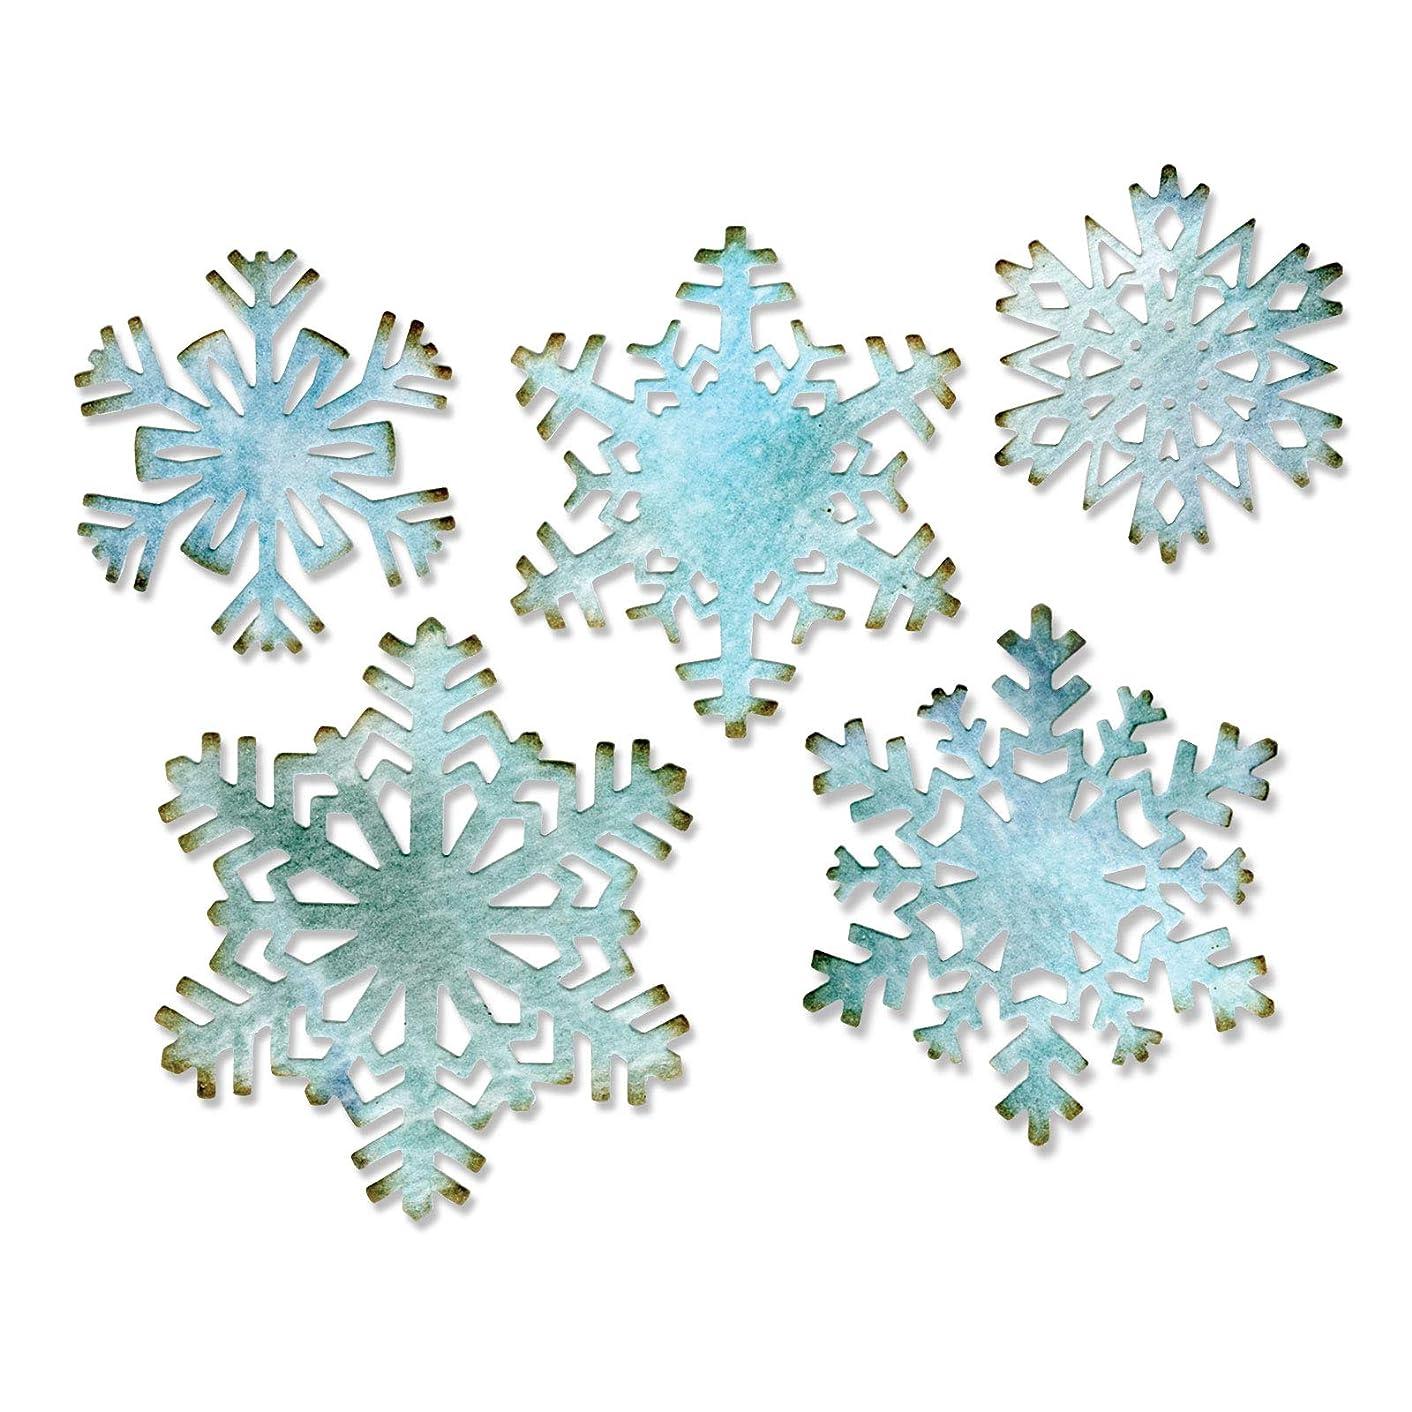 Sizzix 660059 Paper Snowflakes Thinlits Dies by Tim Holtz, 5-Pack